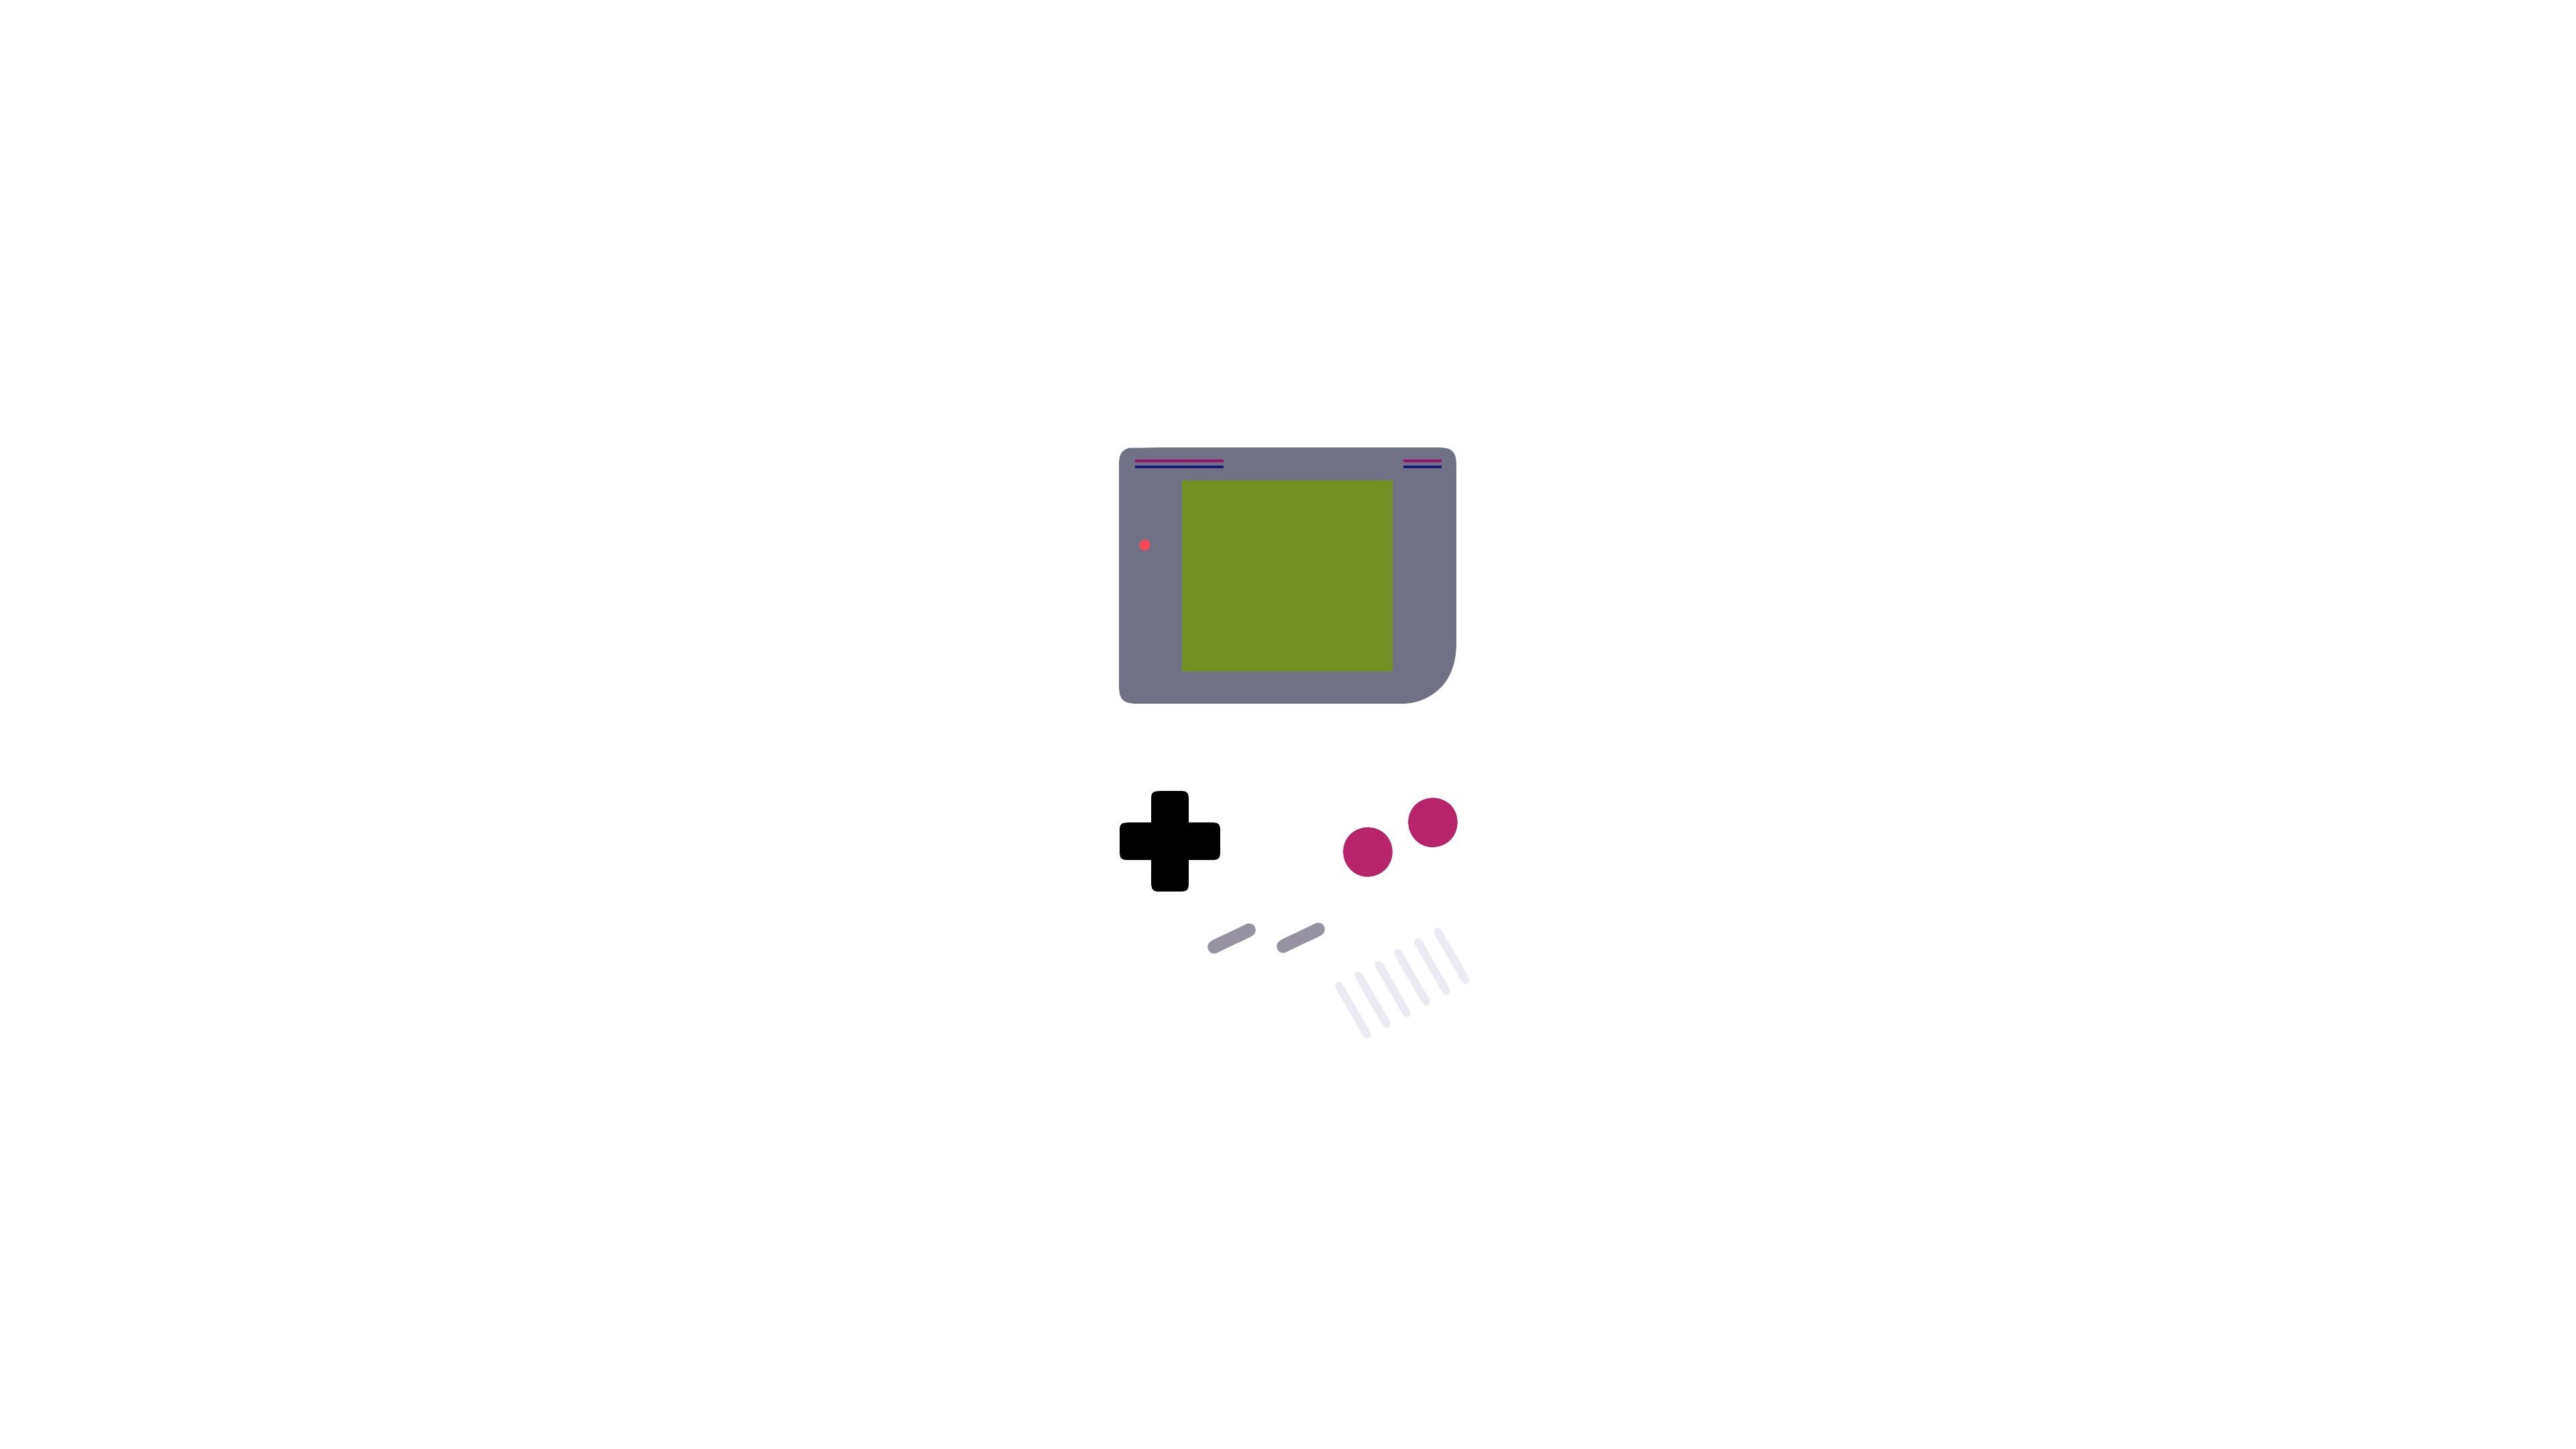 game boy minimalism 4k 1540748524 - Game Boy Minimalism 4k - minimalism wallpapers, game boy wallpapers, digital art wallpapers, artist wallpapers